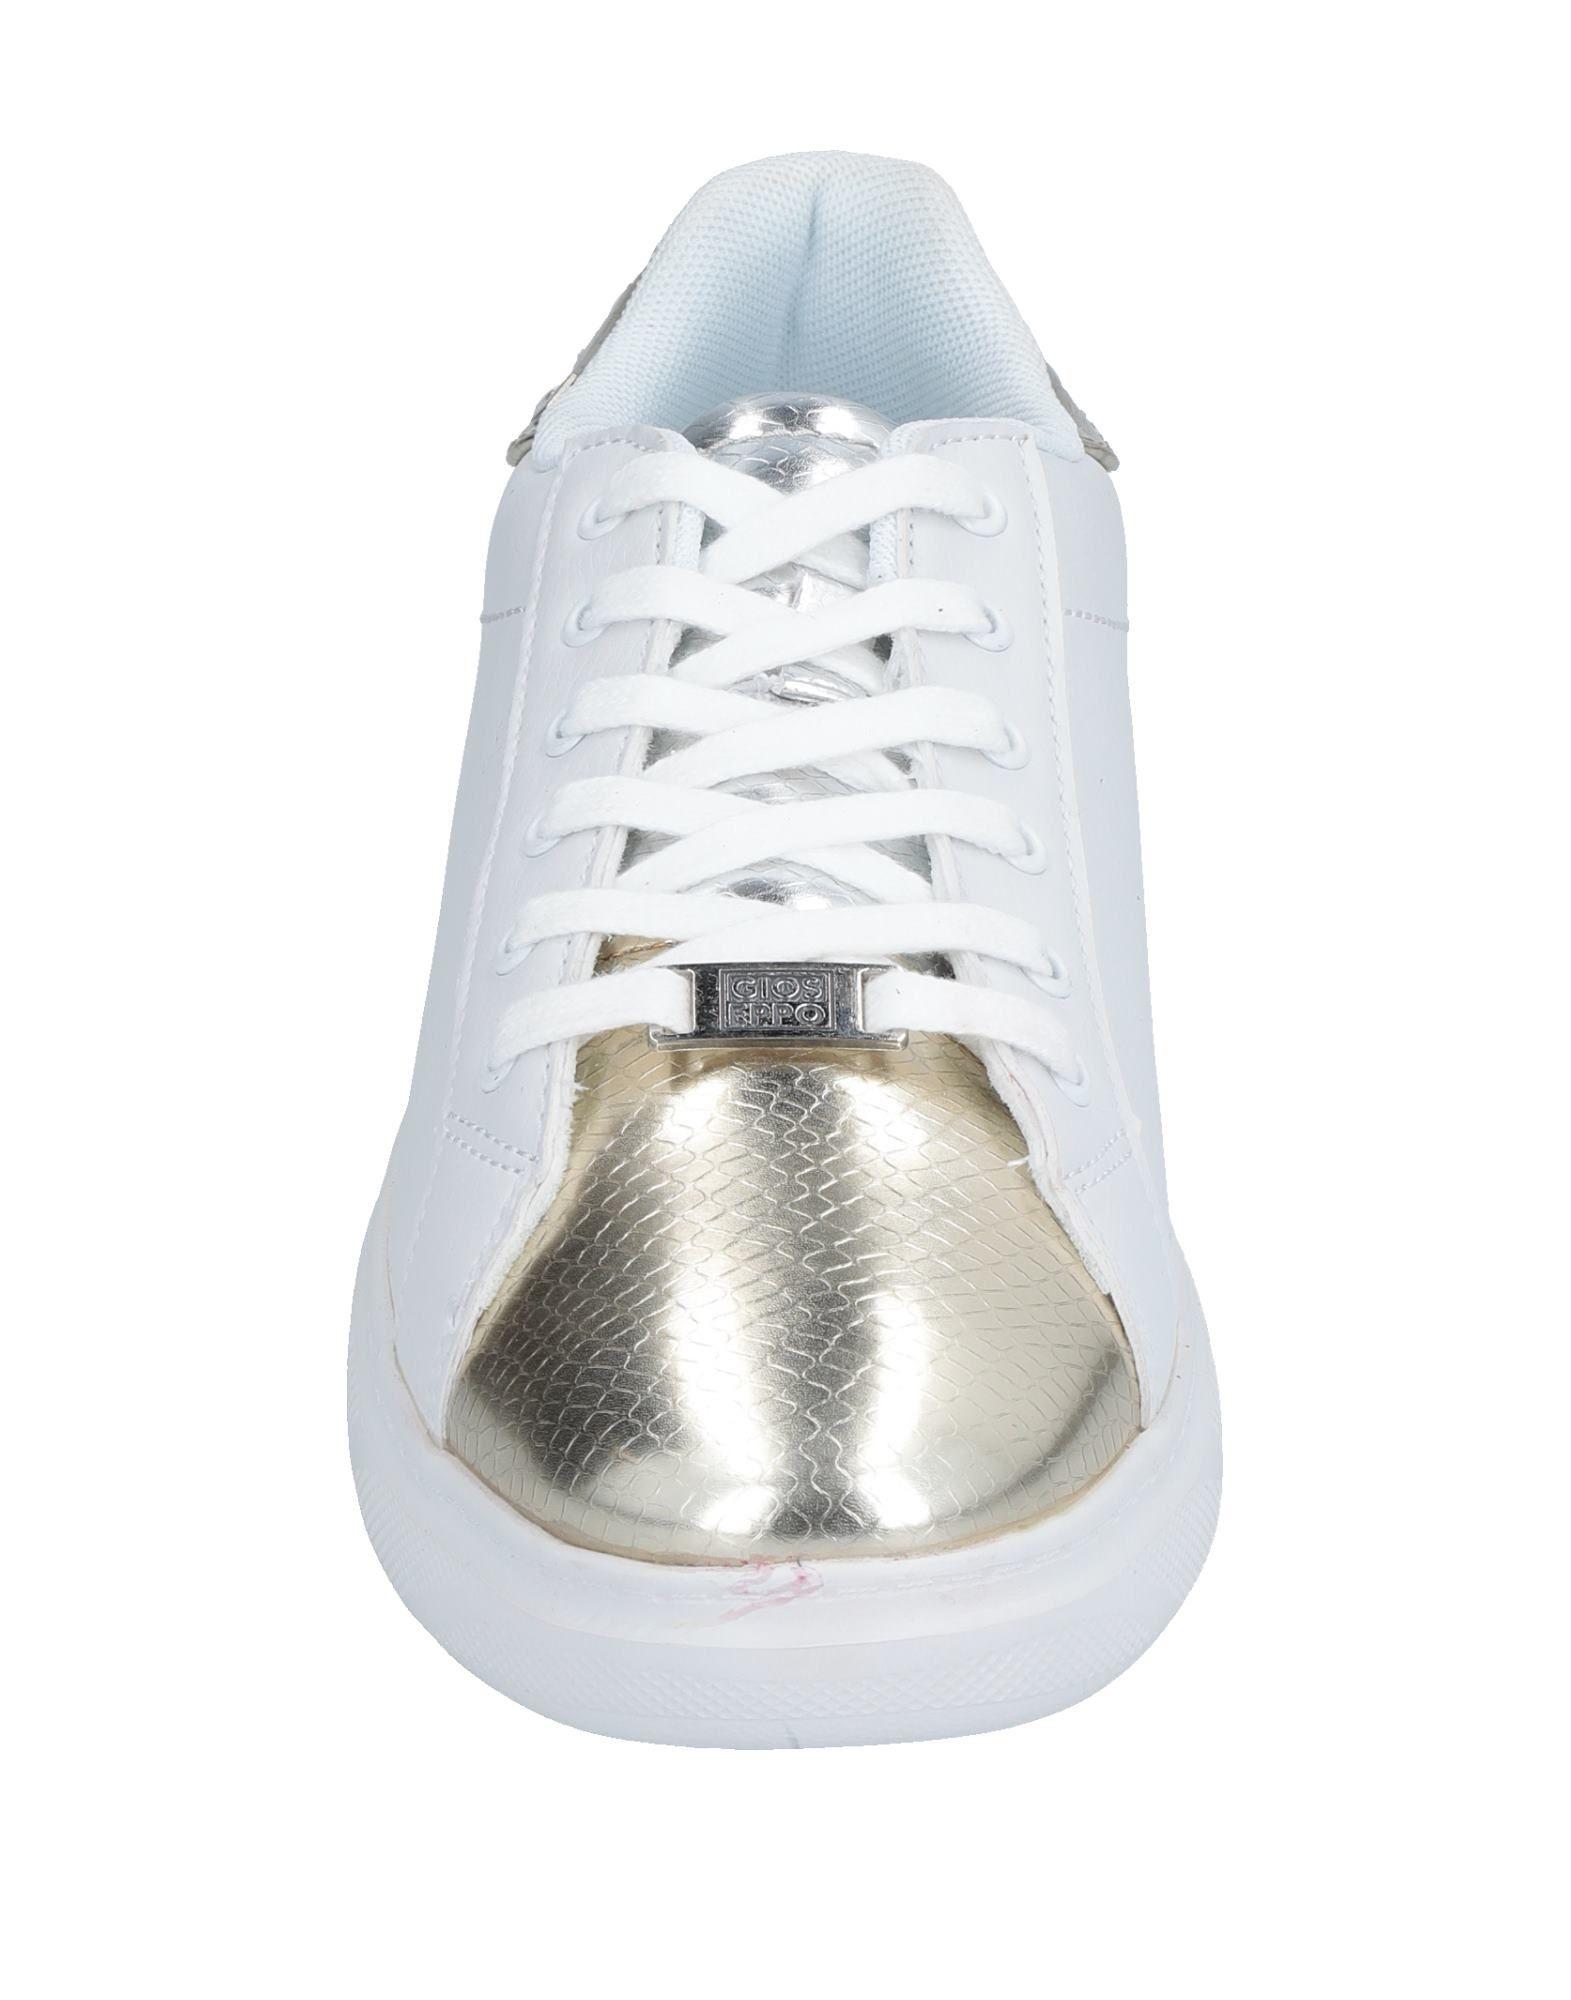 Gioseppo Sneakers Damen Damen Sneakers  11525765XV  f12ca6